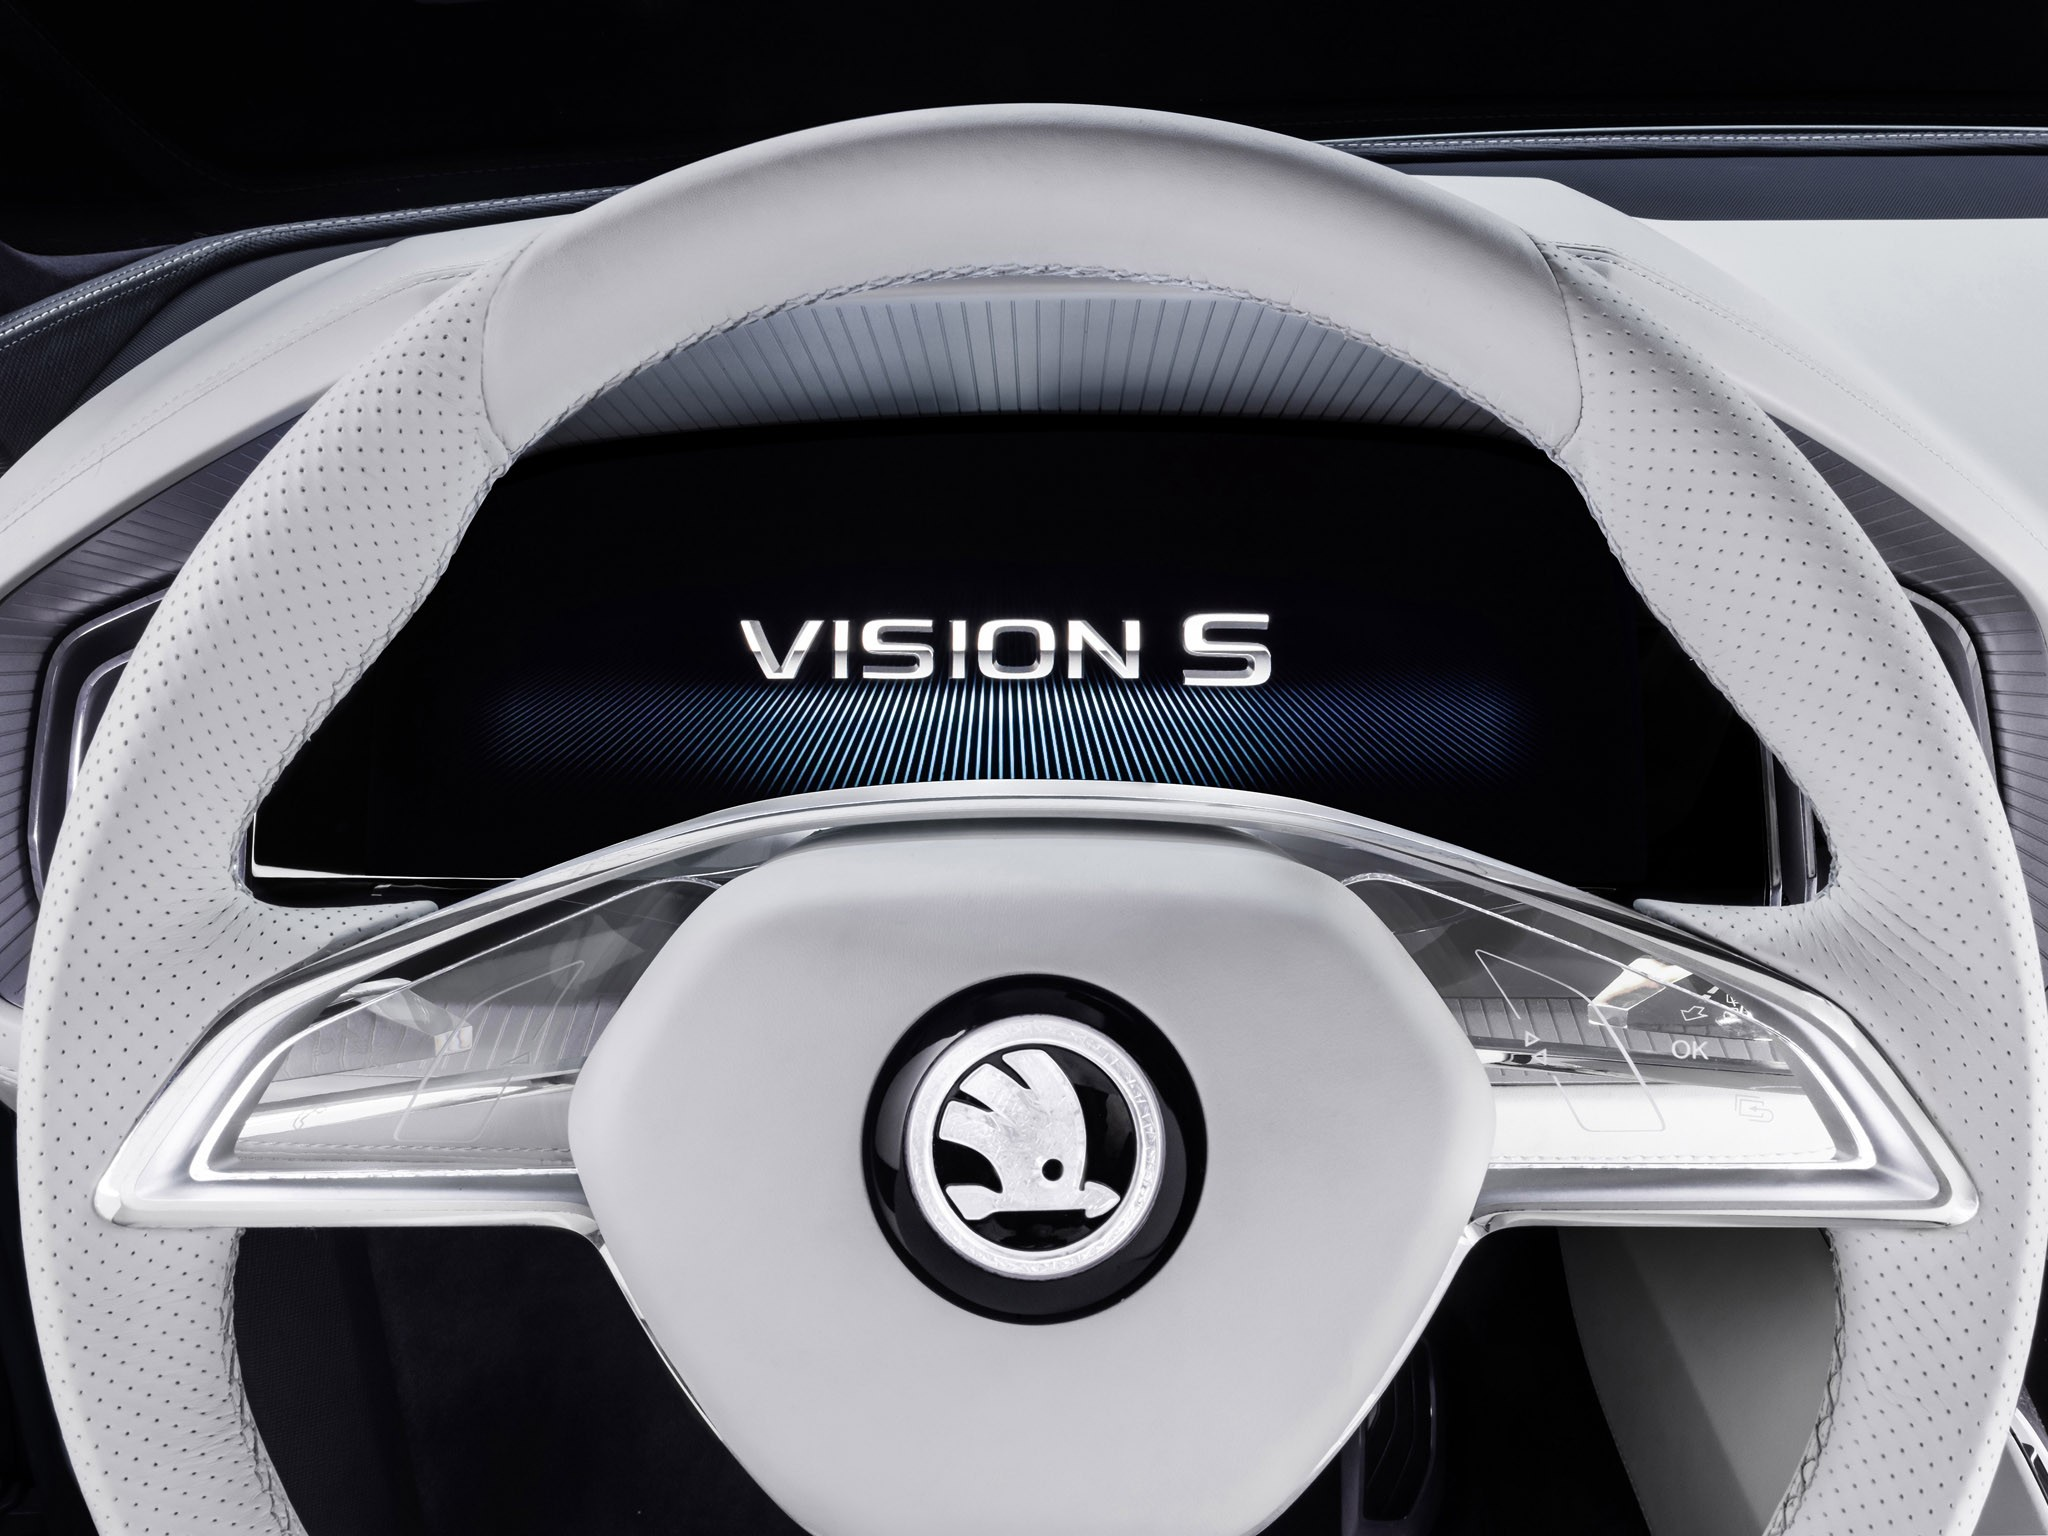 2016 Skoda Visions Concept